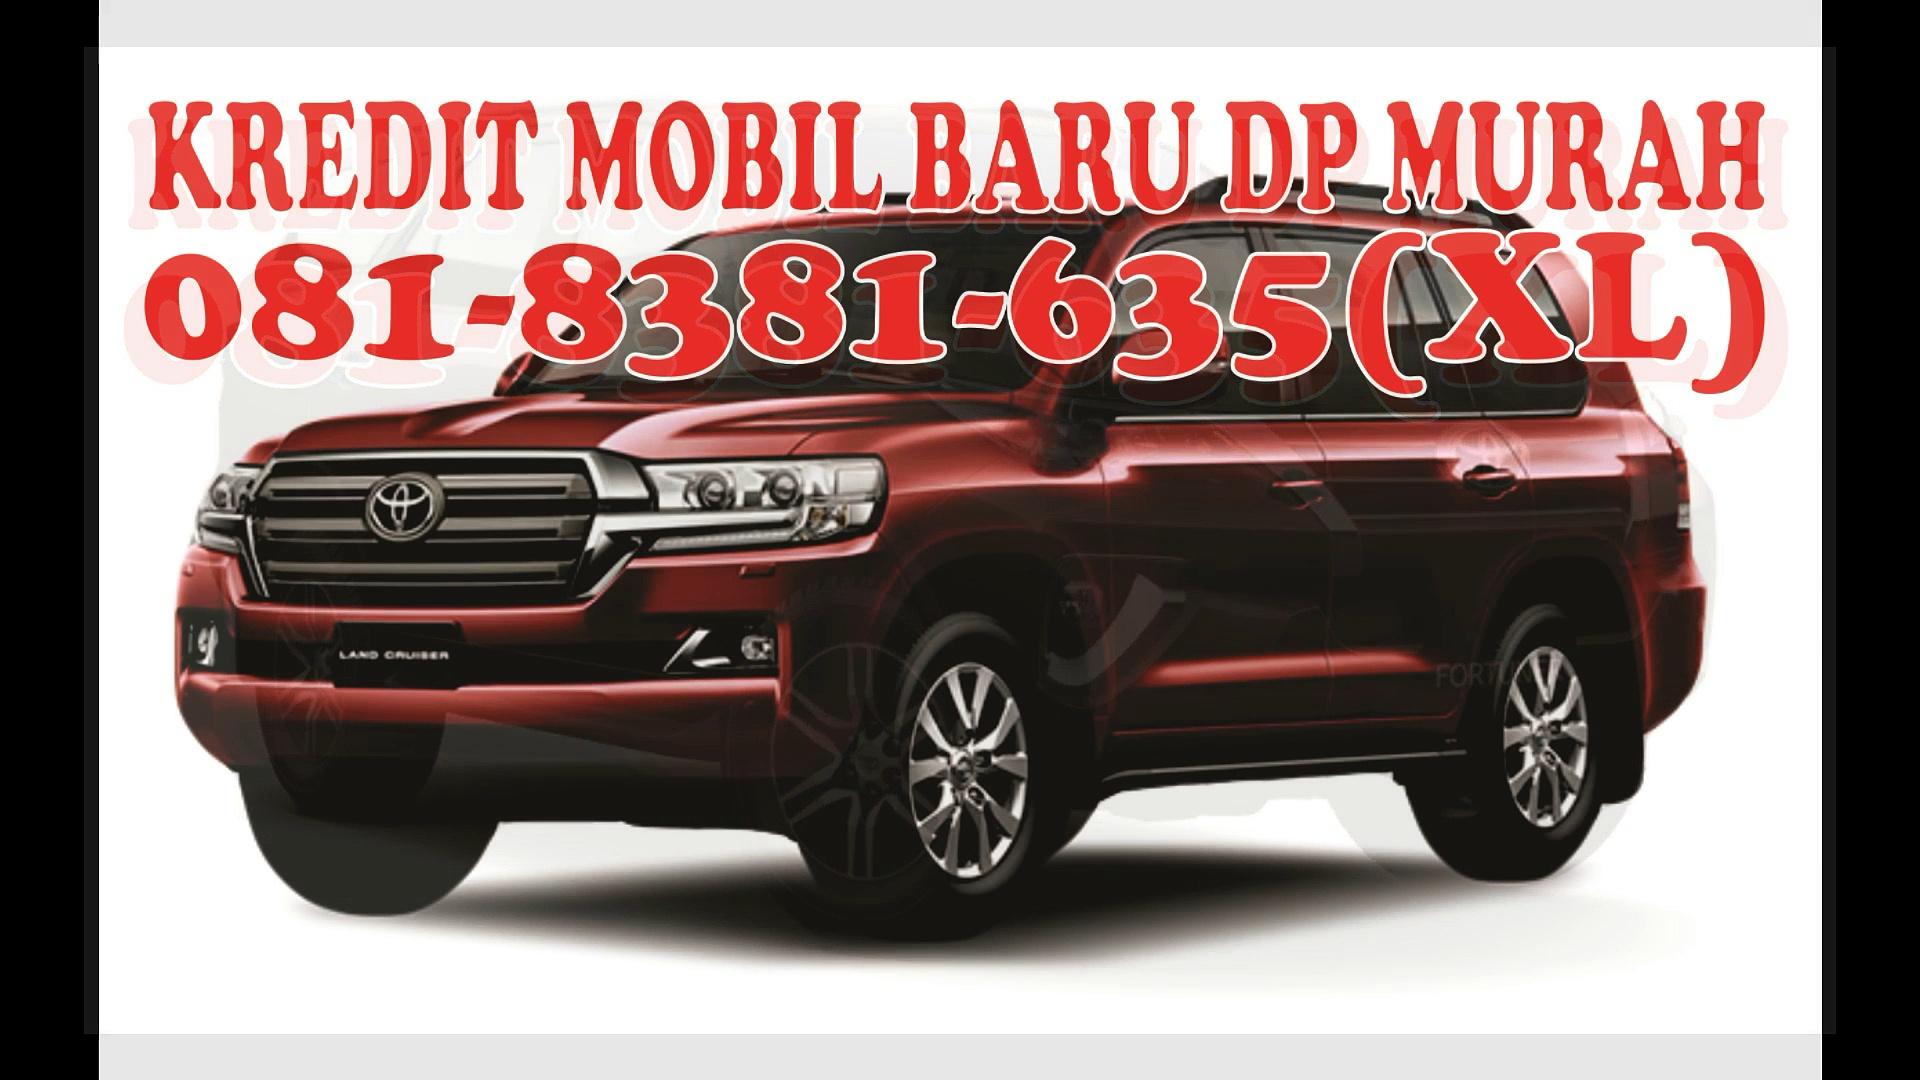 081-8381-635(XL), Toyota Madiun, Dealer Toyota Madiun, Promo Toyota Madiun